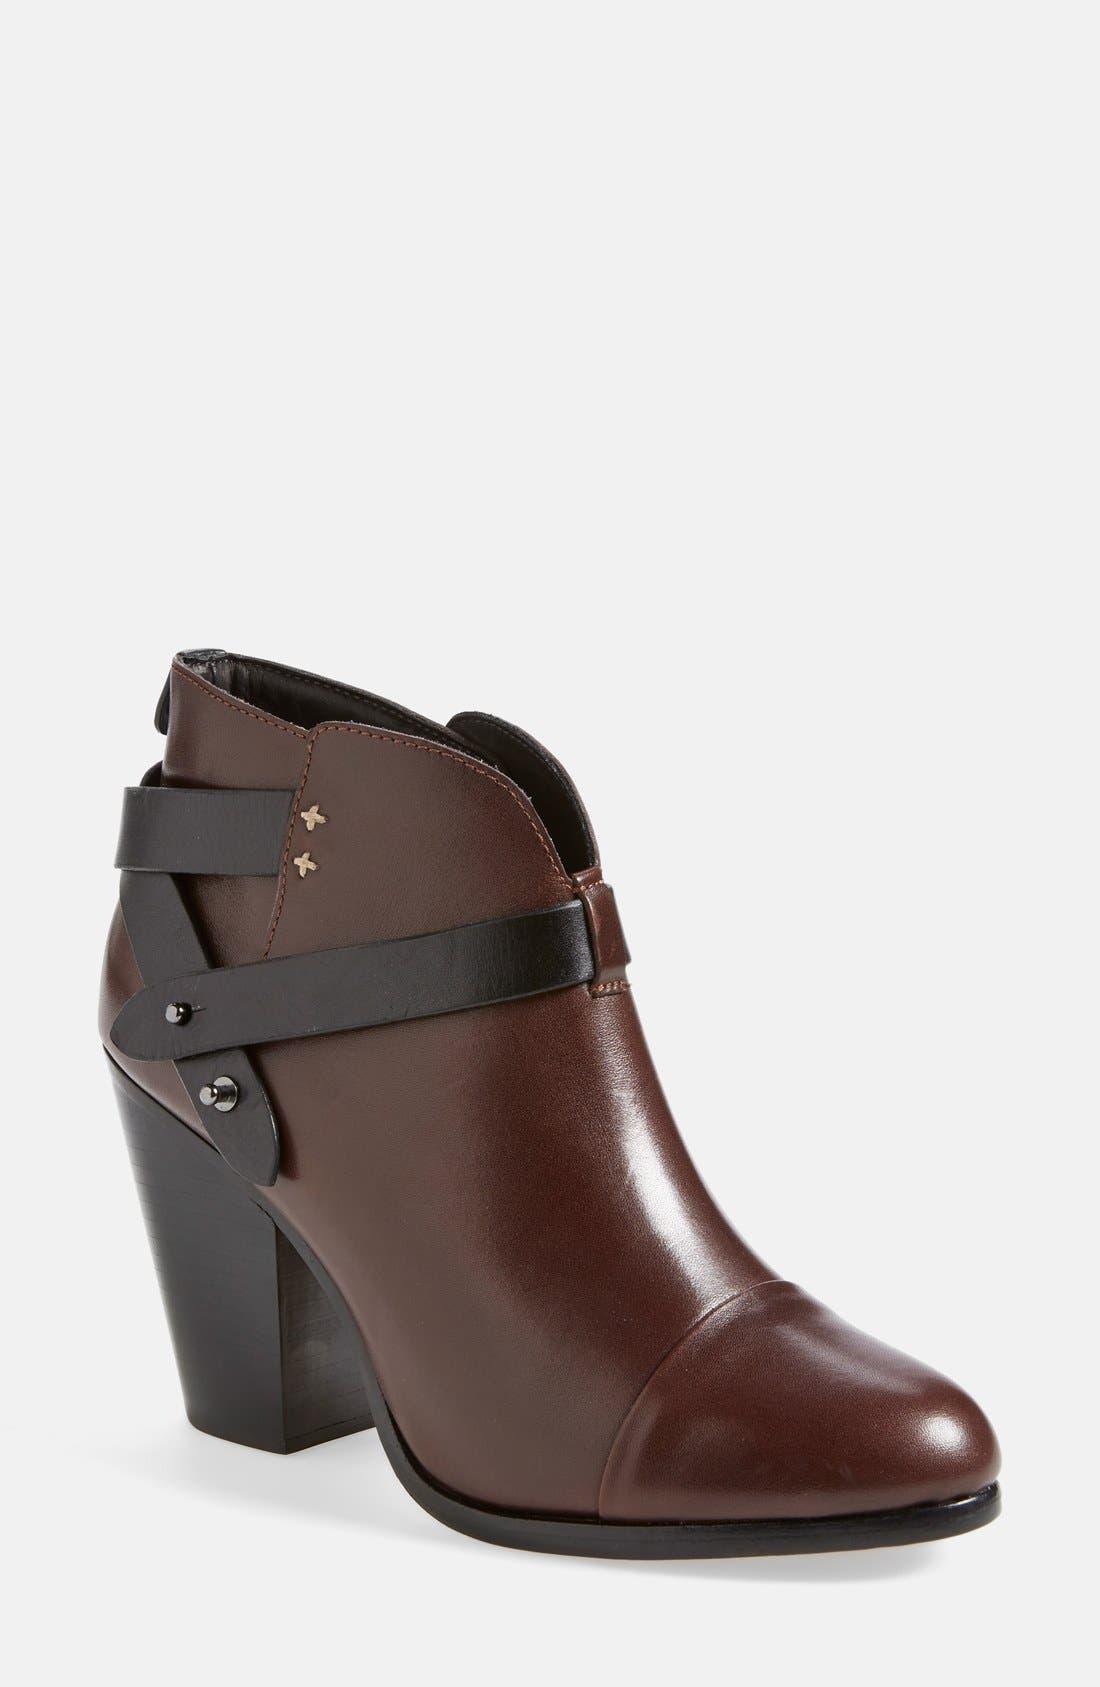 Main Image - rag & bone 'Harrow' Leather Boot (Women) (Nordstrom Exclusive)